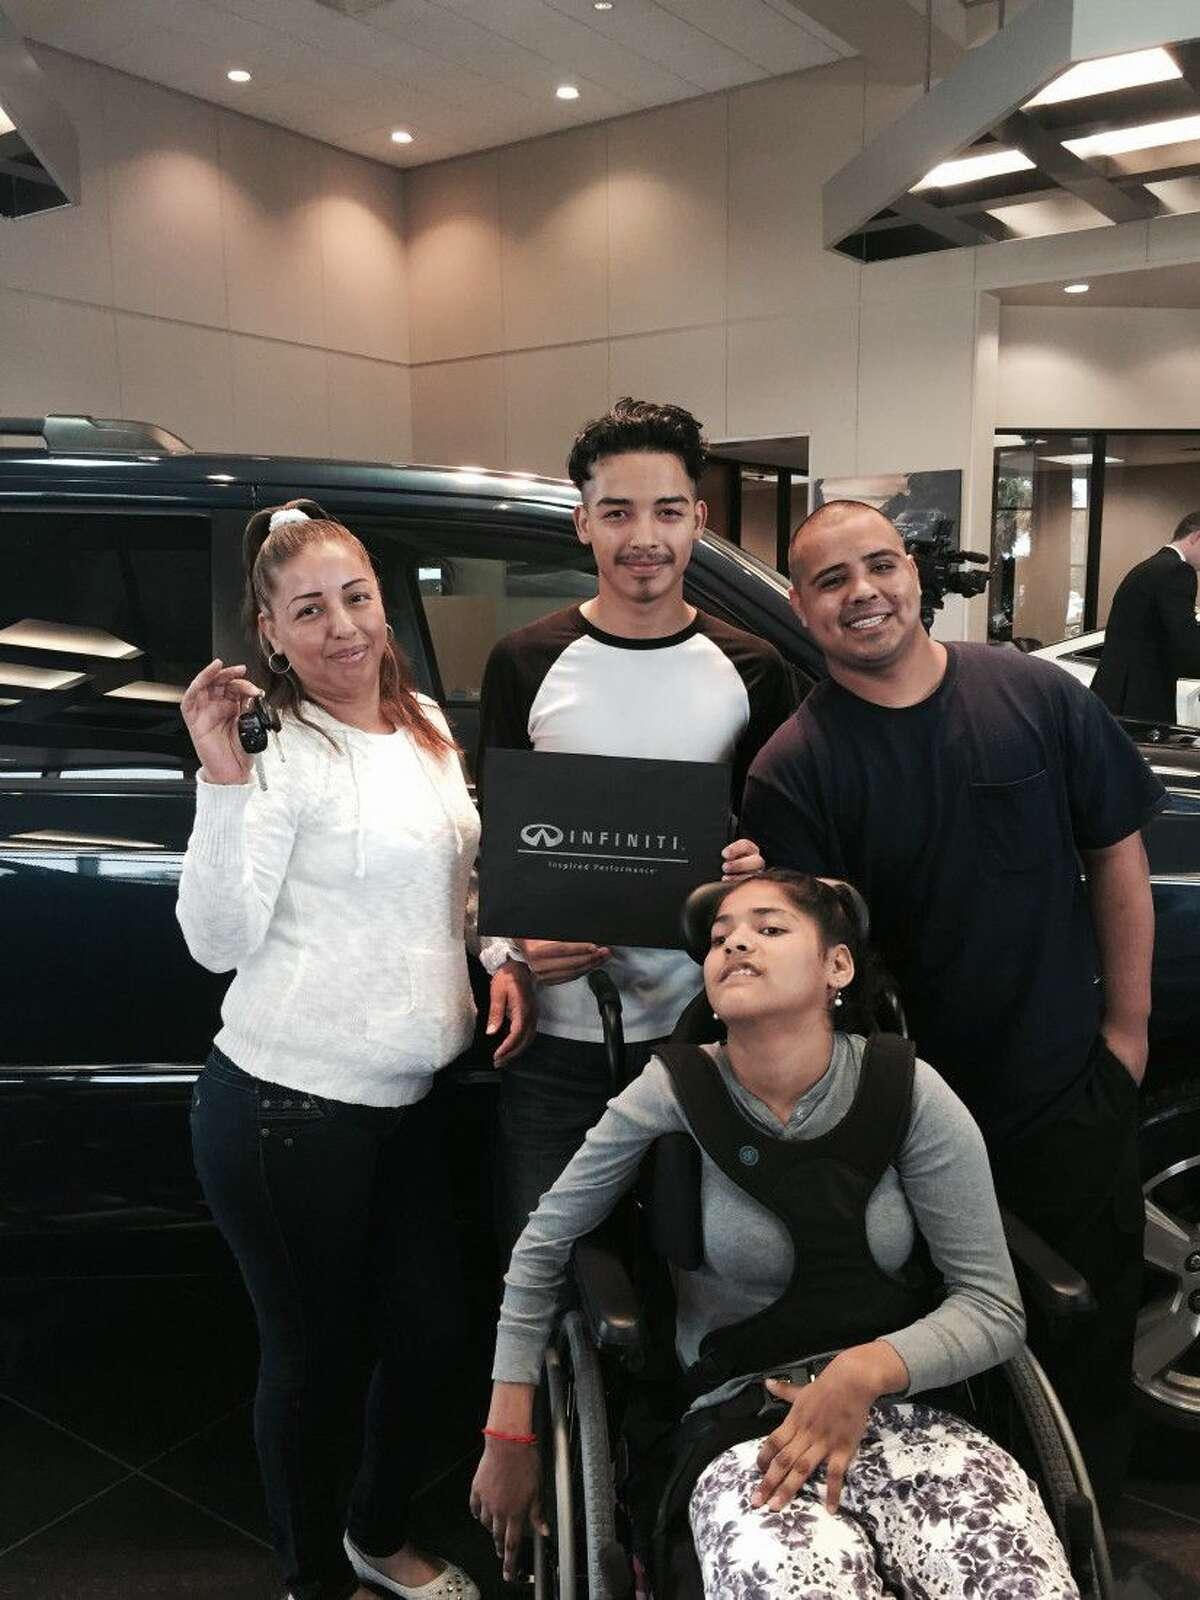 The Hernandez familty getting the keys to their Honda Pilot. Socorro, Jaime, Pablo and Angela Hernandez.